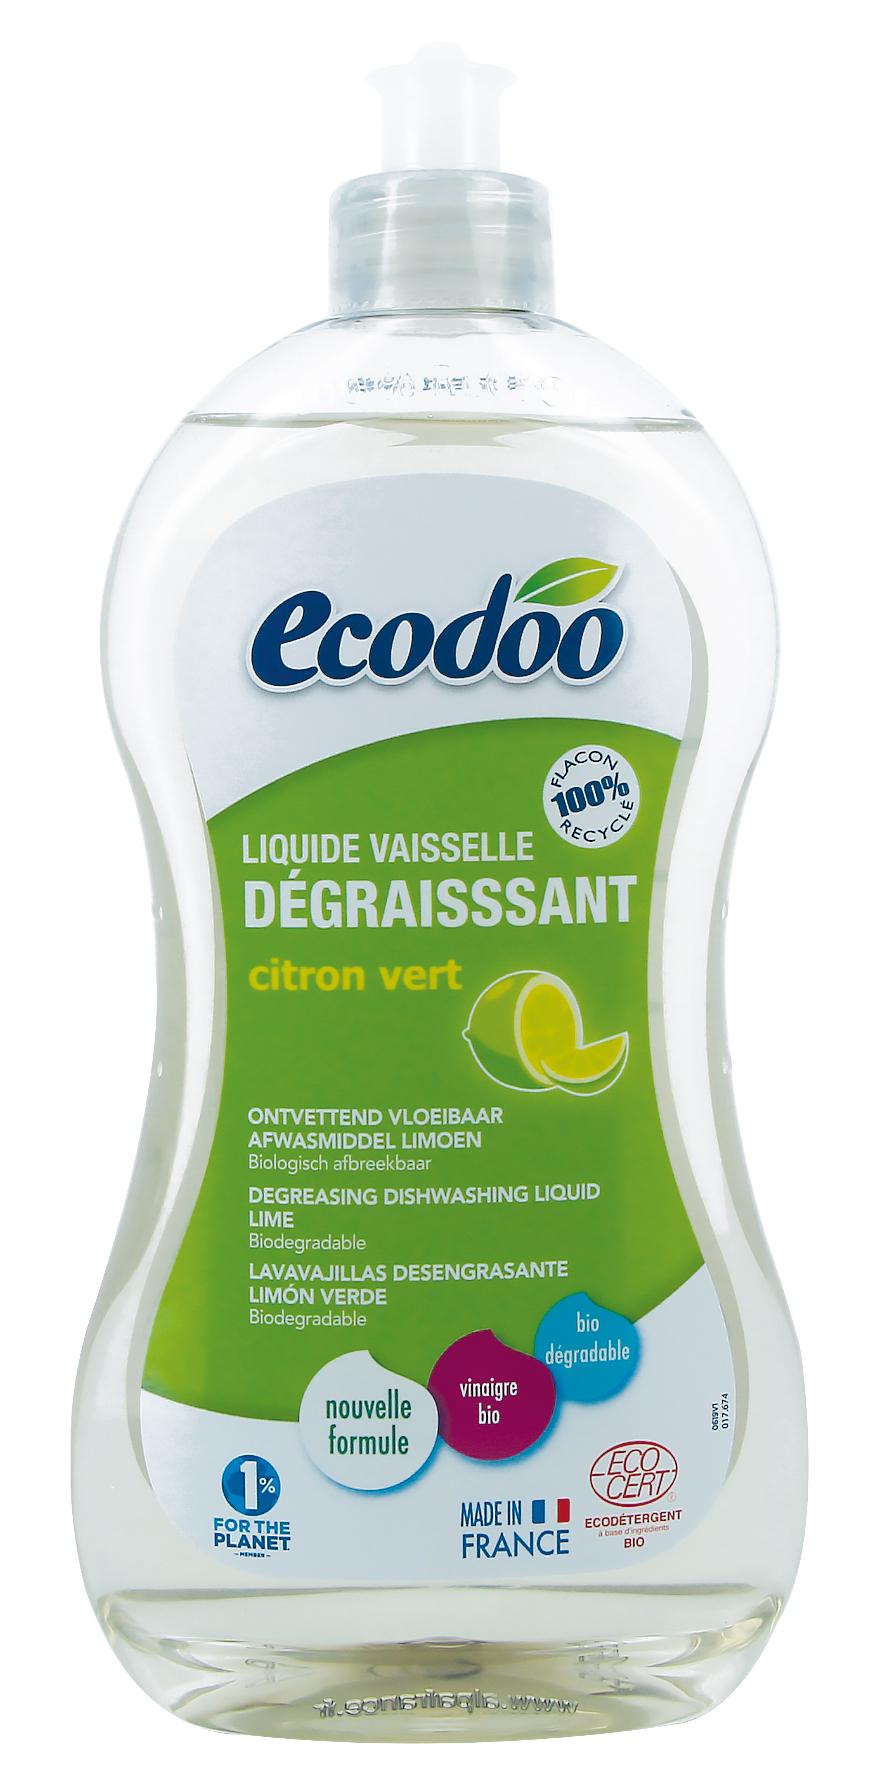 Ecodoo astianpesuaine rasvaa vastaan, lime